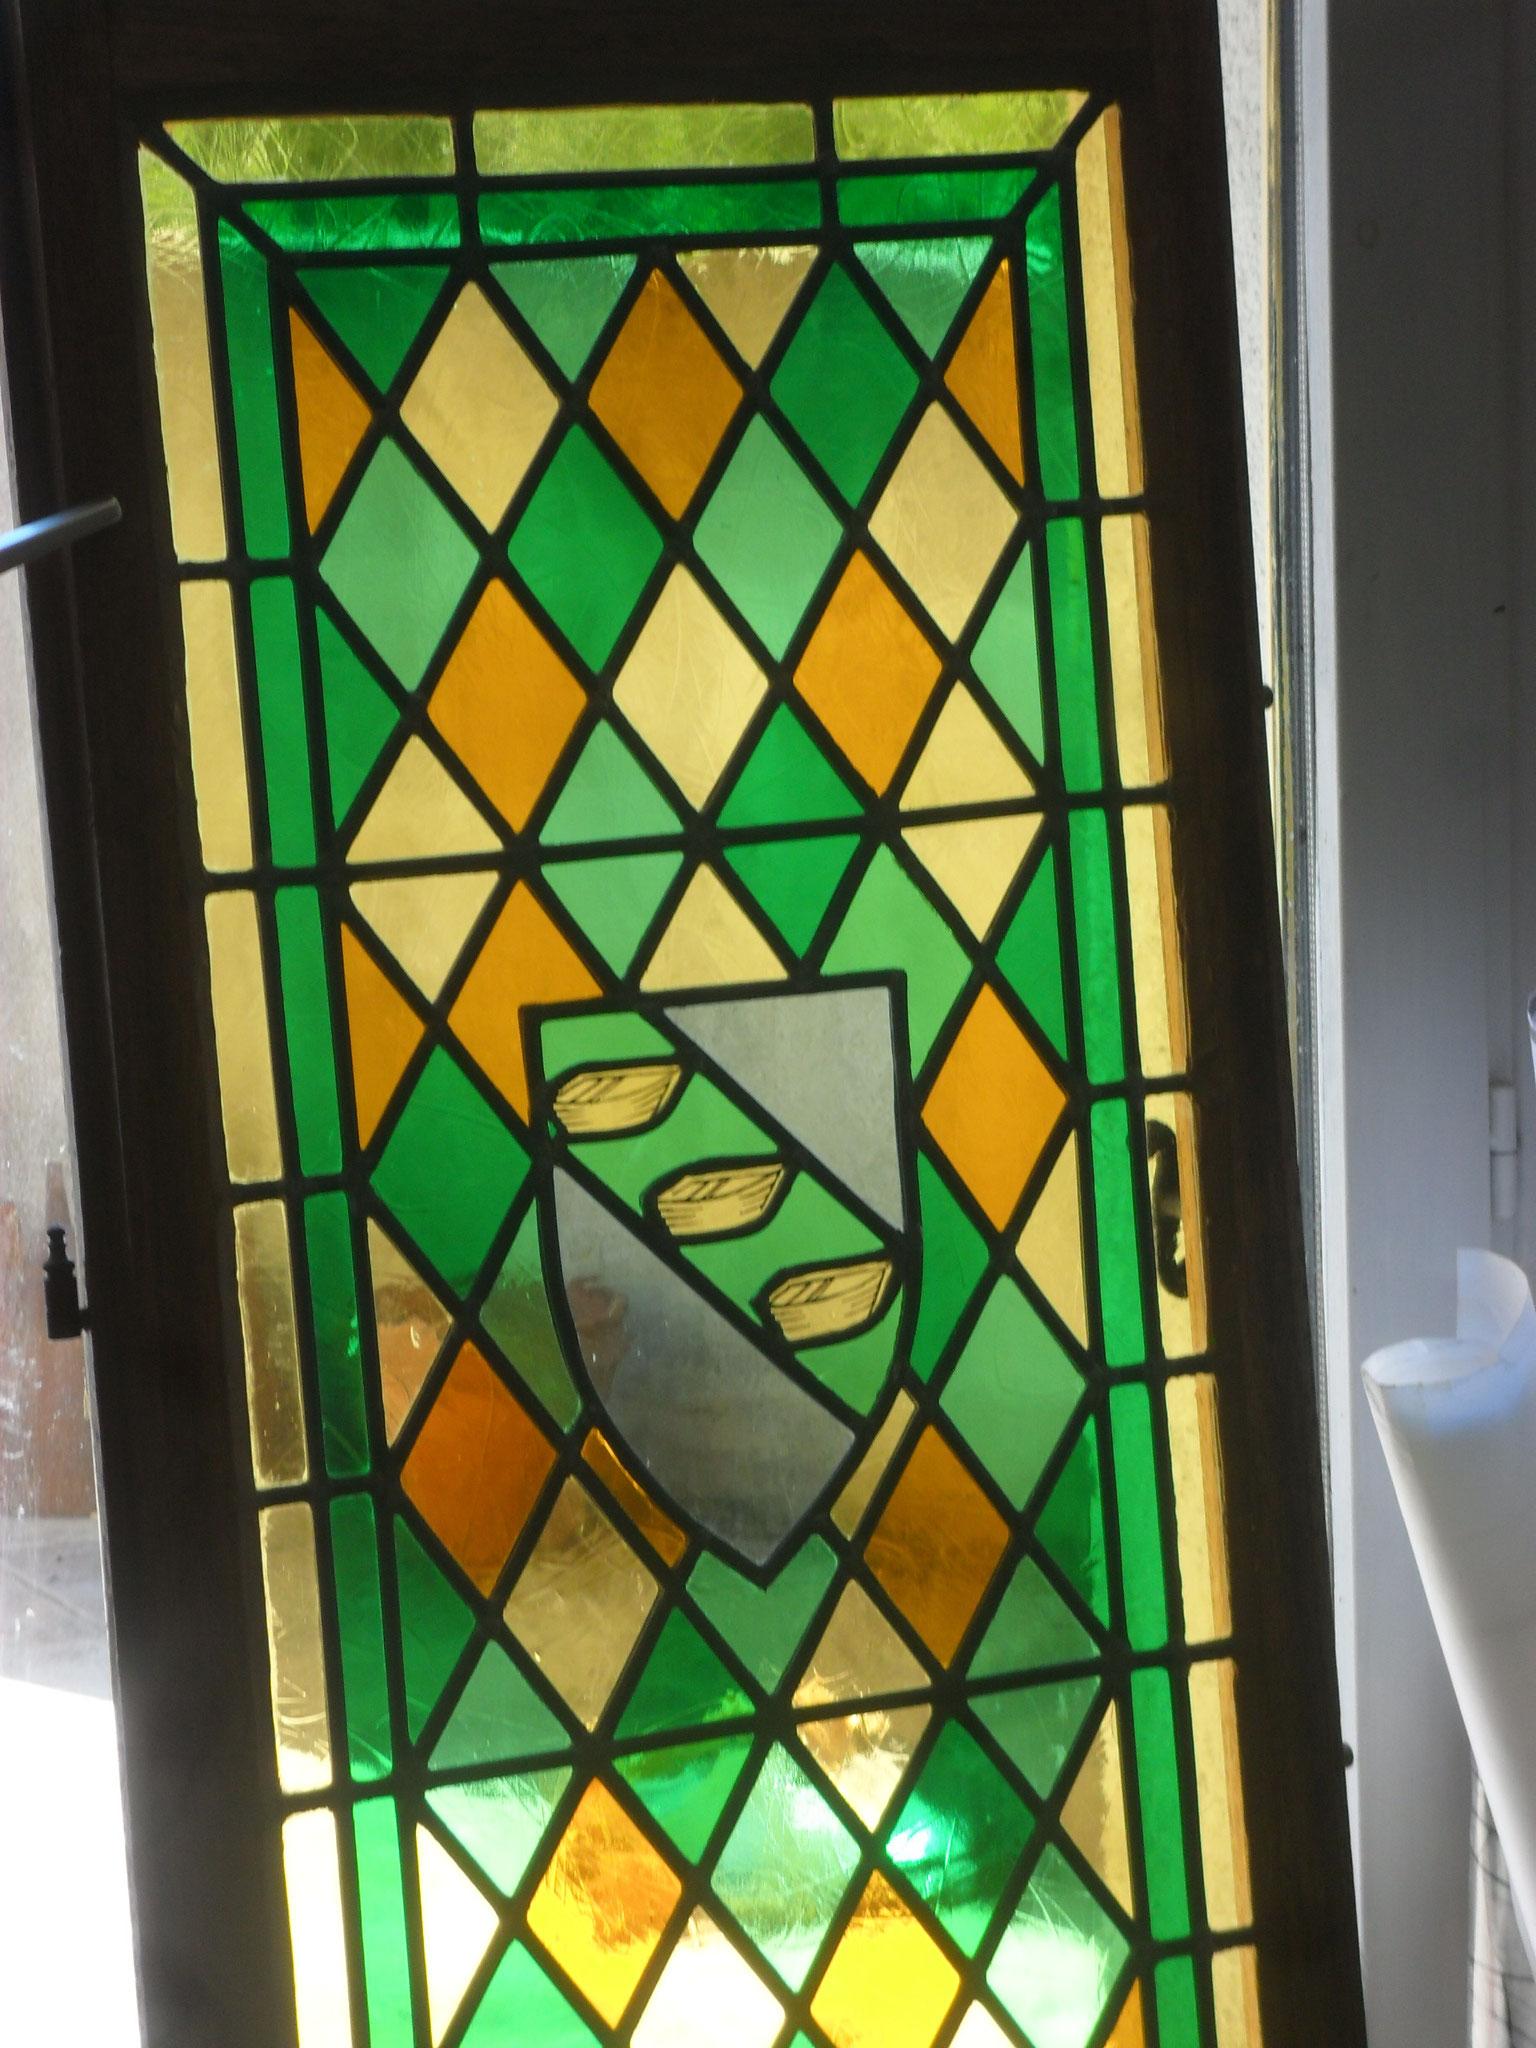 Vitrail au blason de la ville de Nant (12)-Art du vitrail